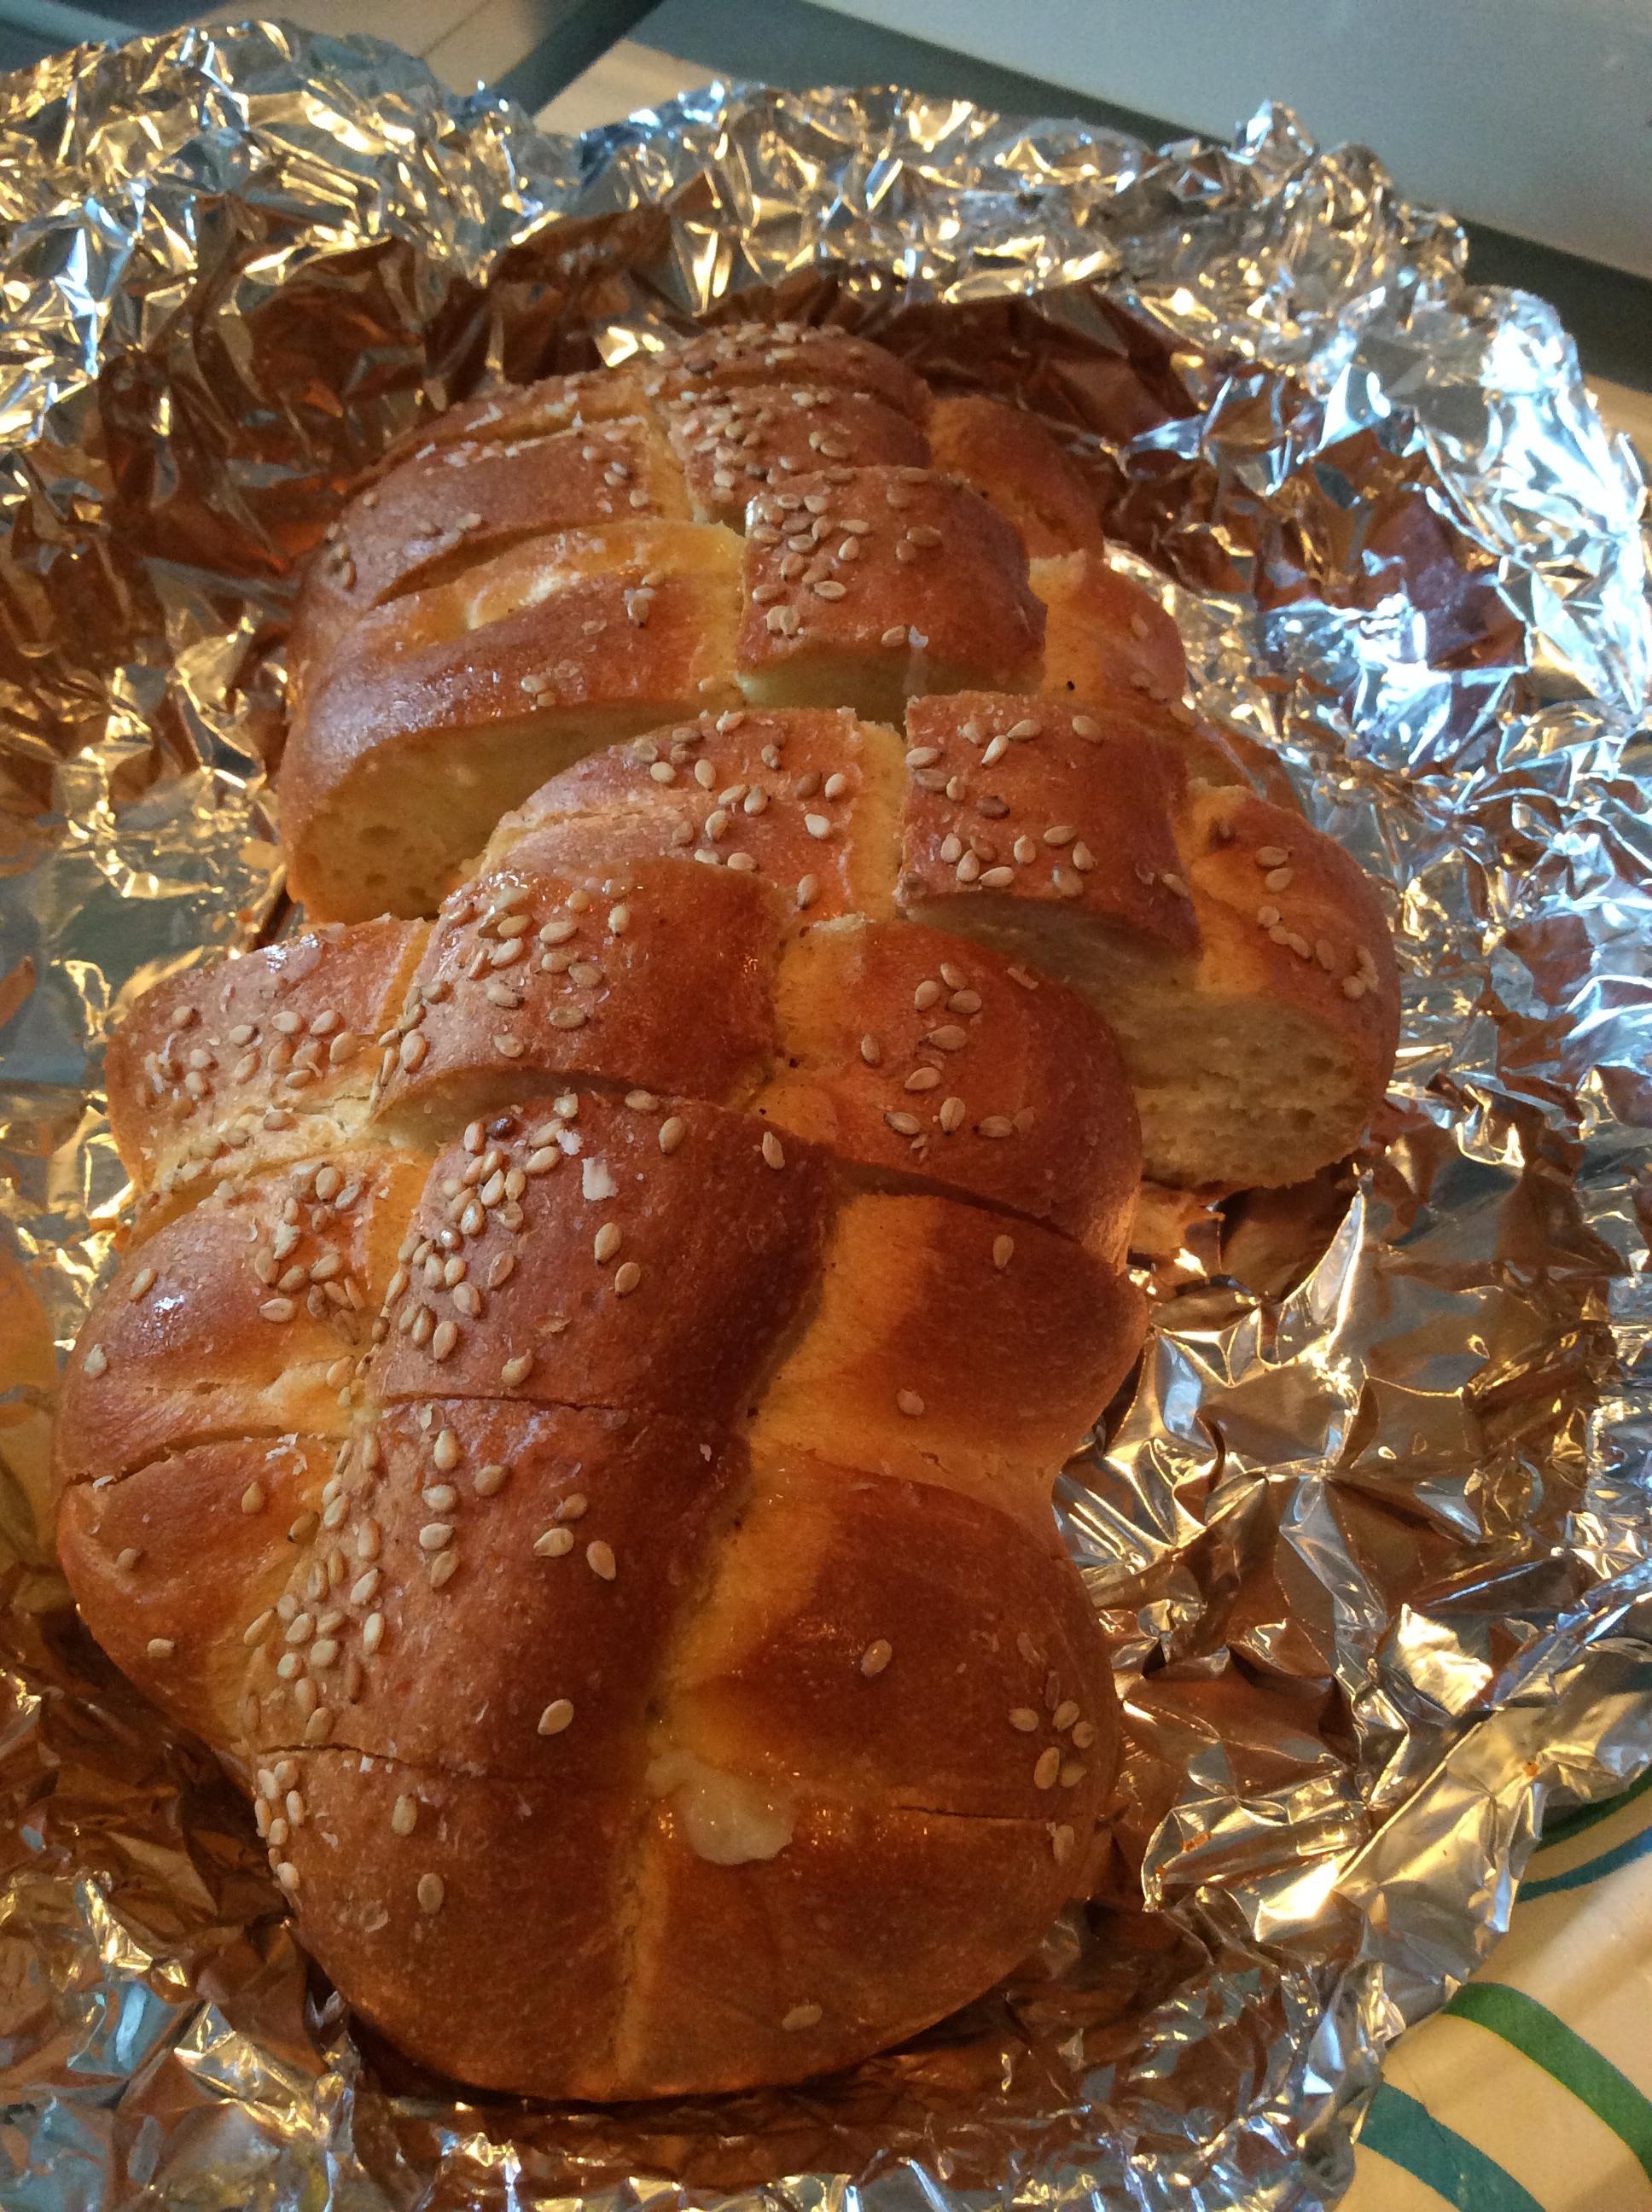 Roasted Garlic & Pecorino Romano Bread | Sparks from the ...